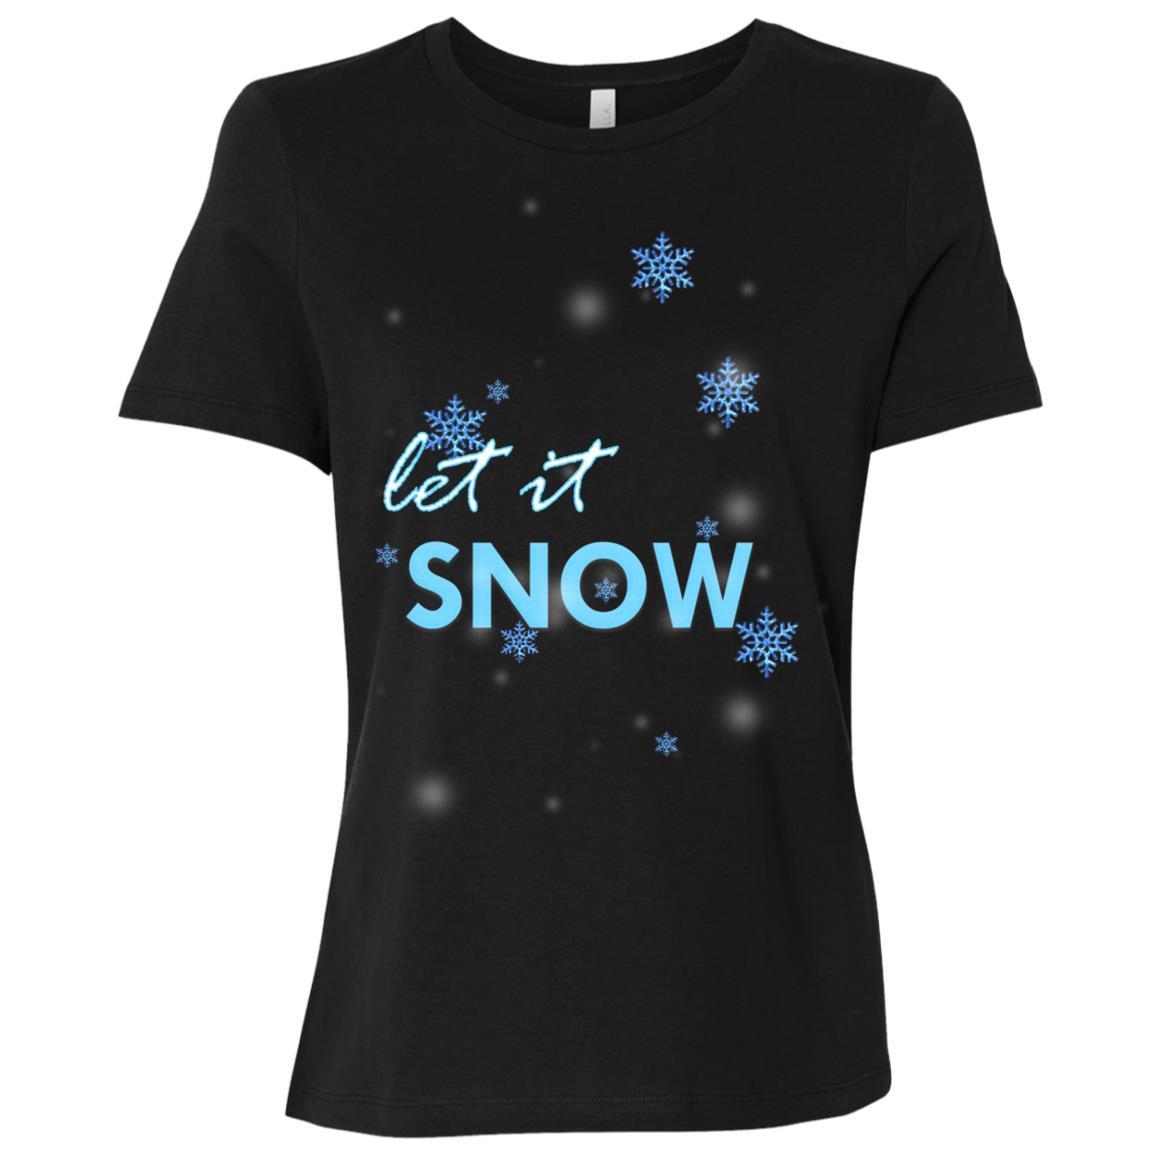 Let it Snow Women Short Sleeve T-Shirt